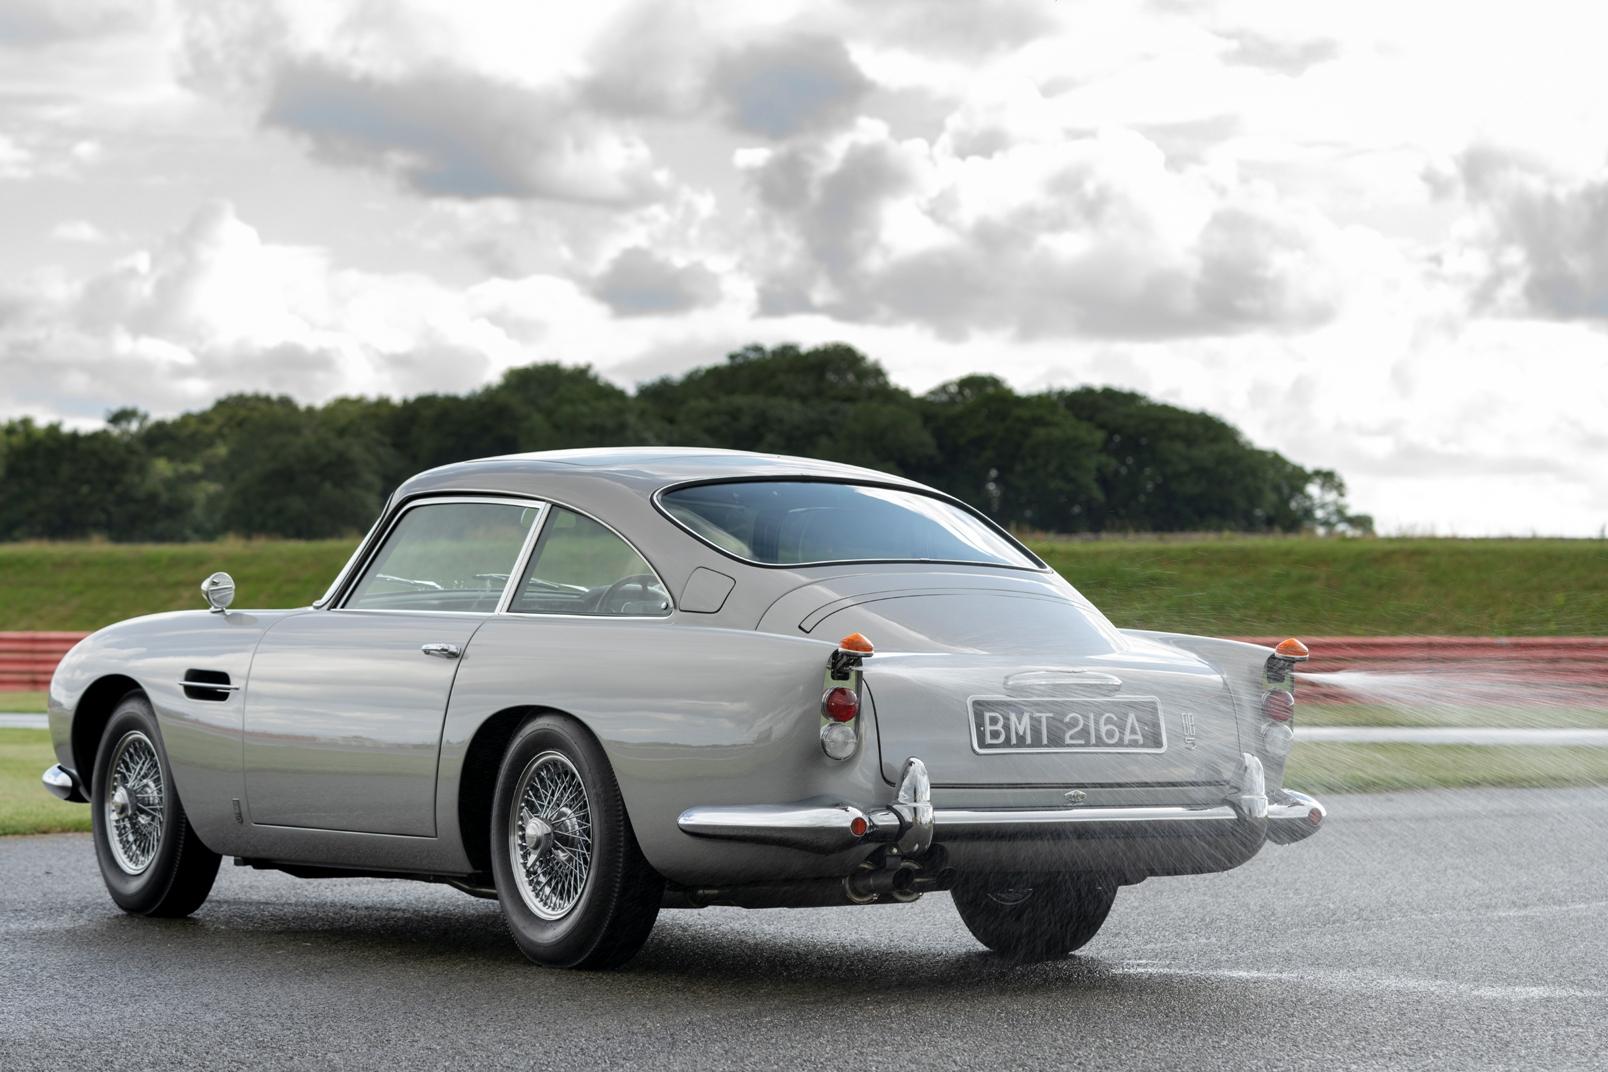 Aston Martin Db5 Goldfinger (17)